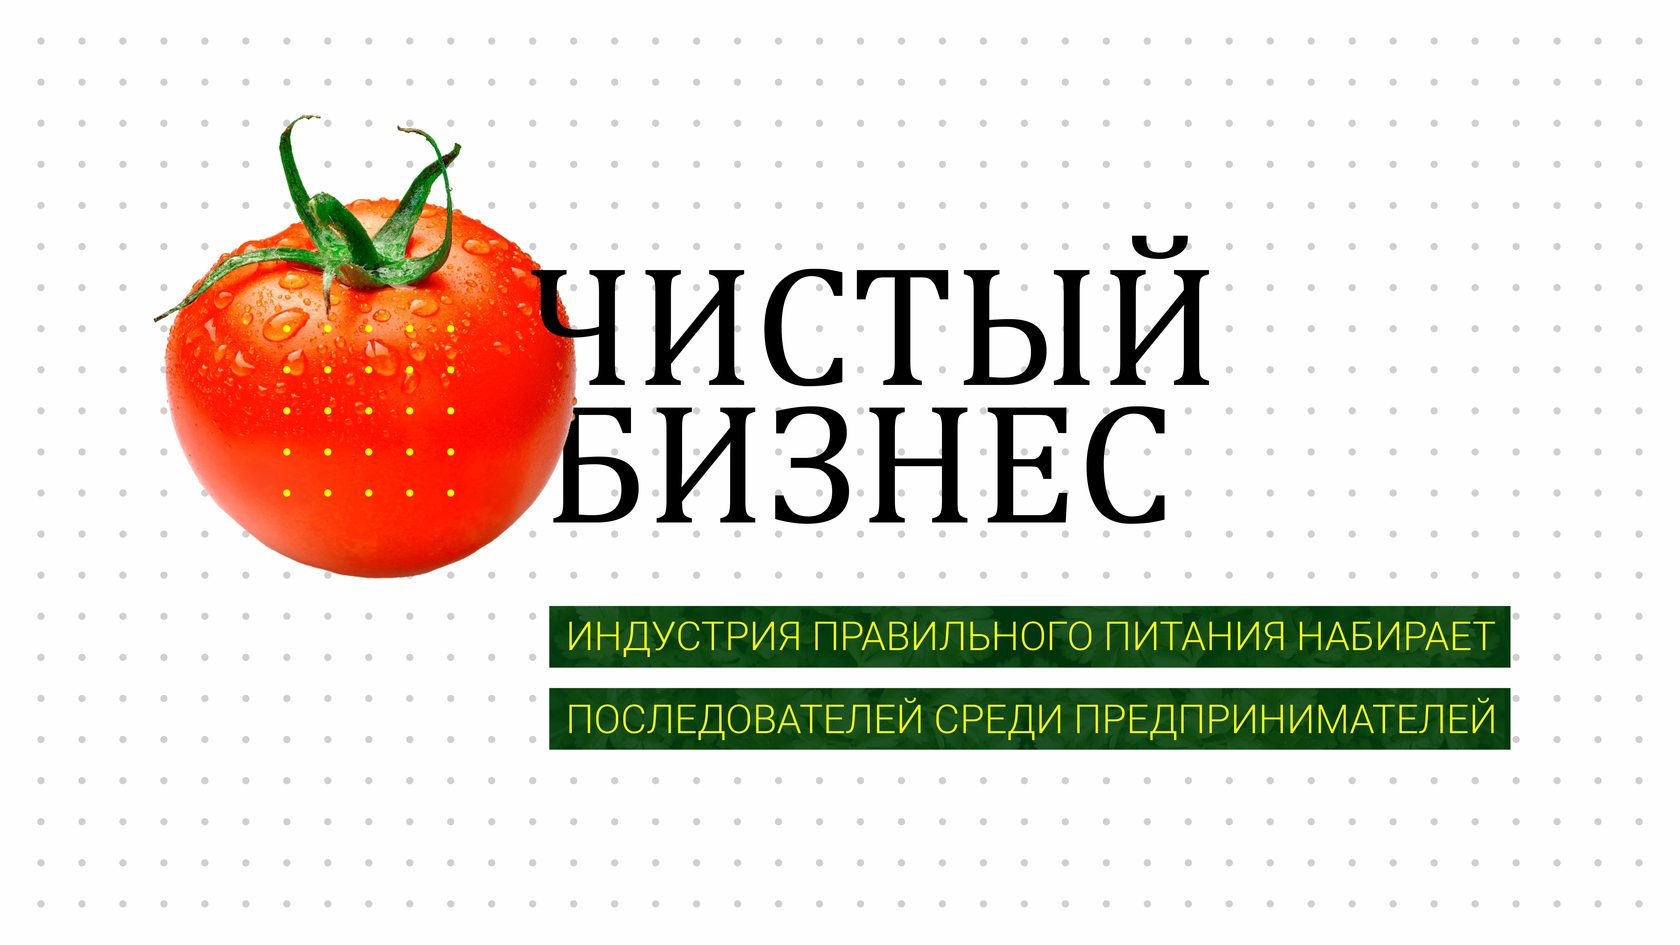 https://inbusiness.kz/ru/images/mediumthree/19/images/TTUAyHA9.jpg